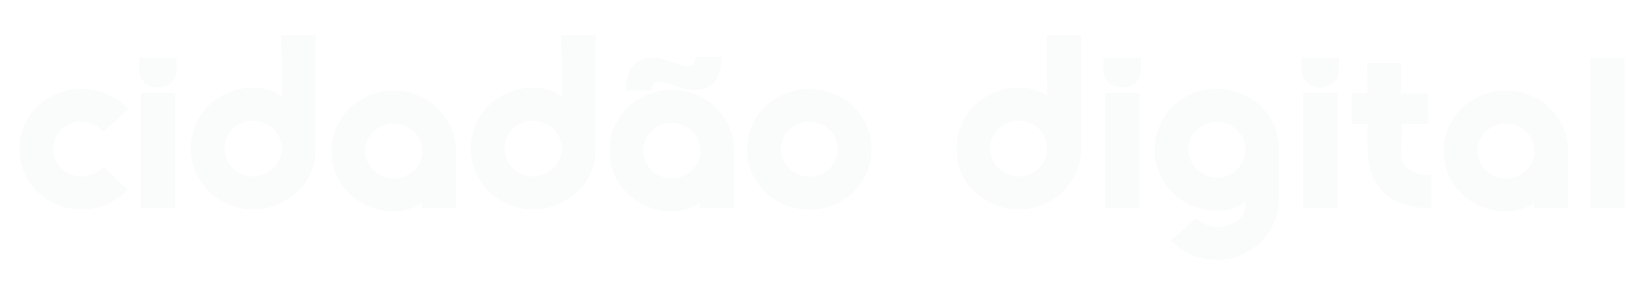 Cidadao Digital